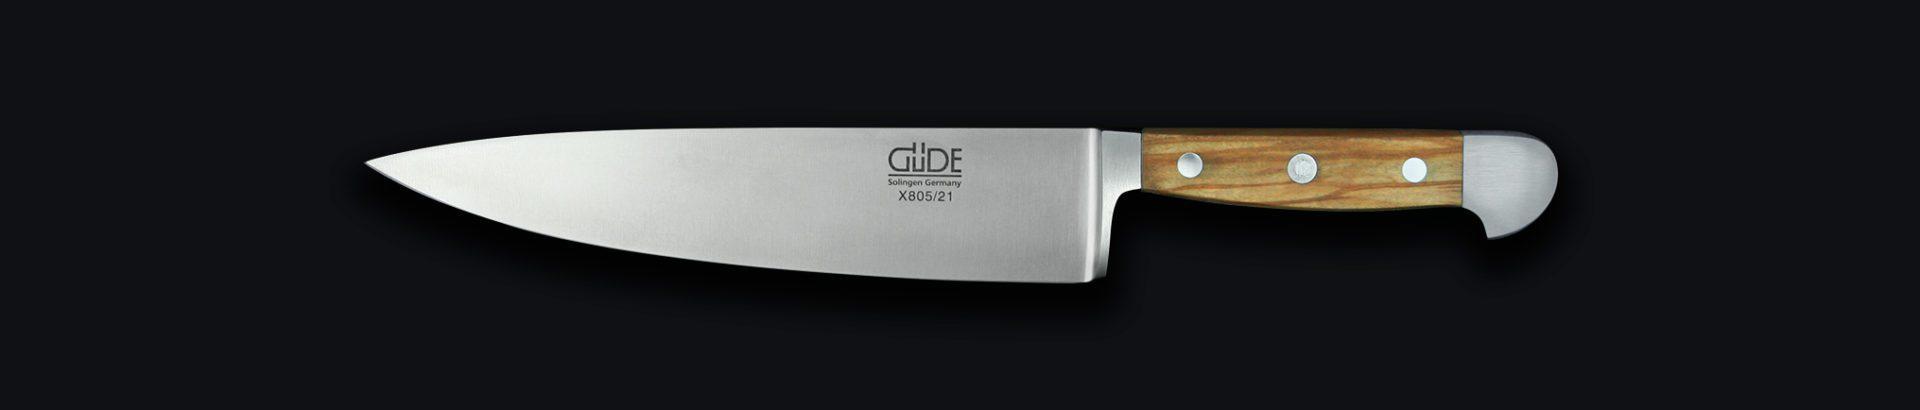 Messer Solingen, Güde Messer, Kochmesser Solingen, Messerset, wetzstahl, solinger messer